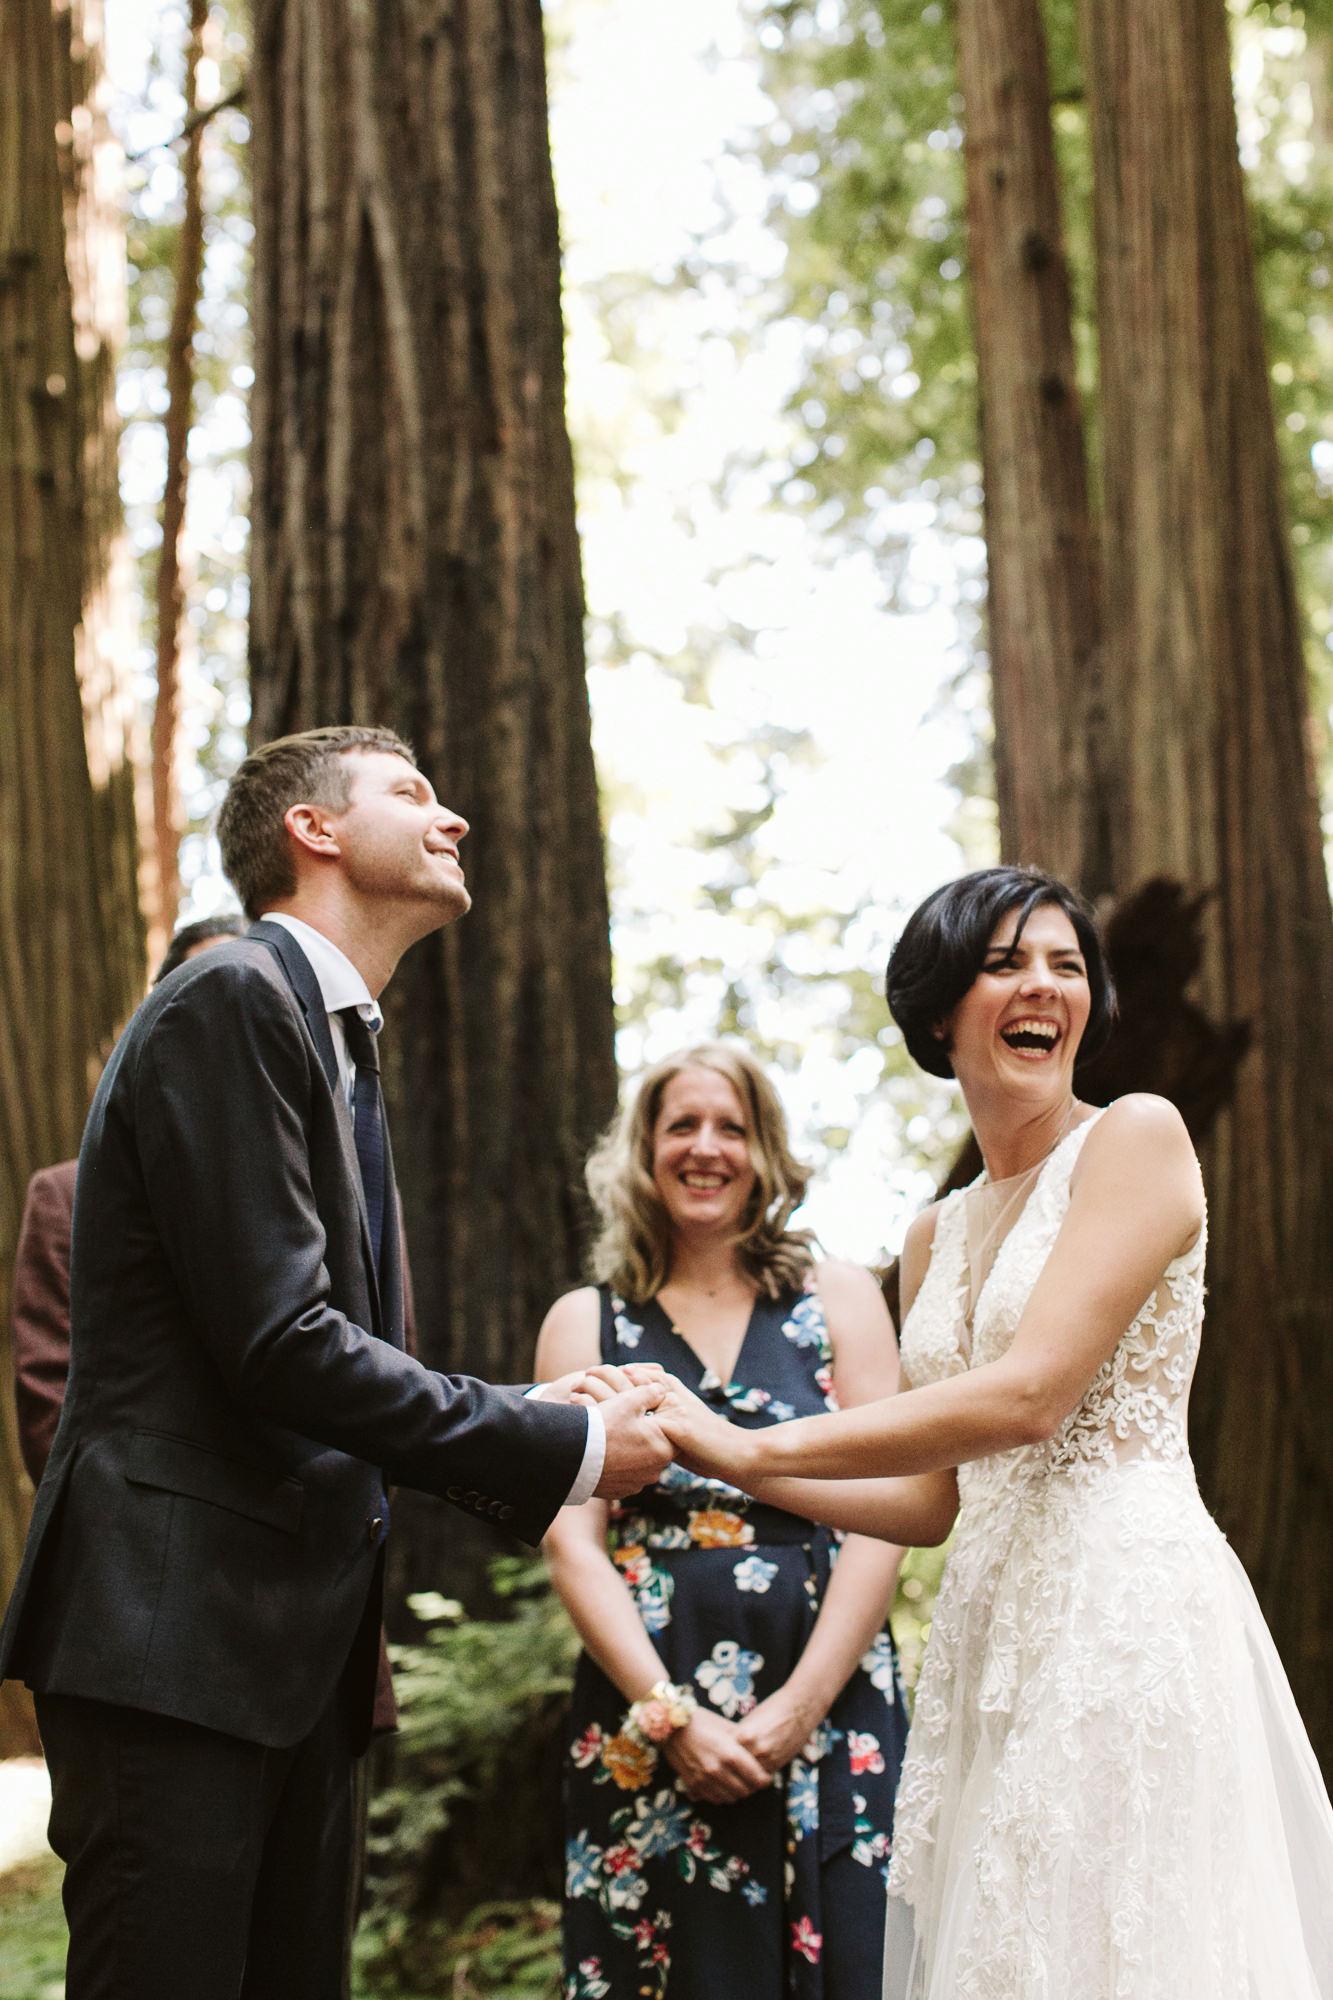 California-wedding-photographer-alfonso-flores-pamplin-groove-204.jpg